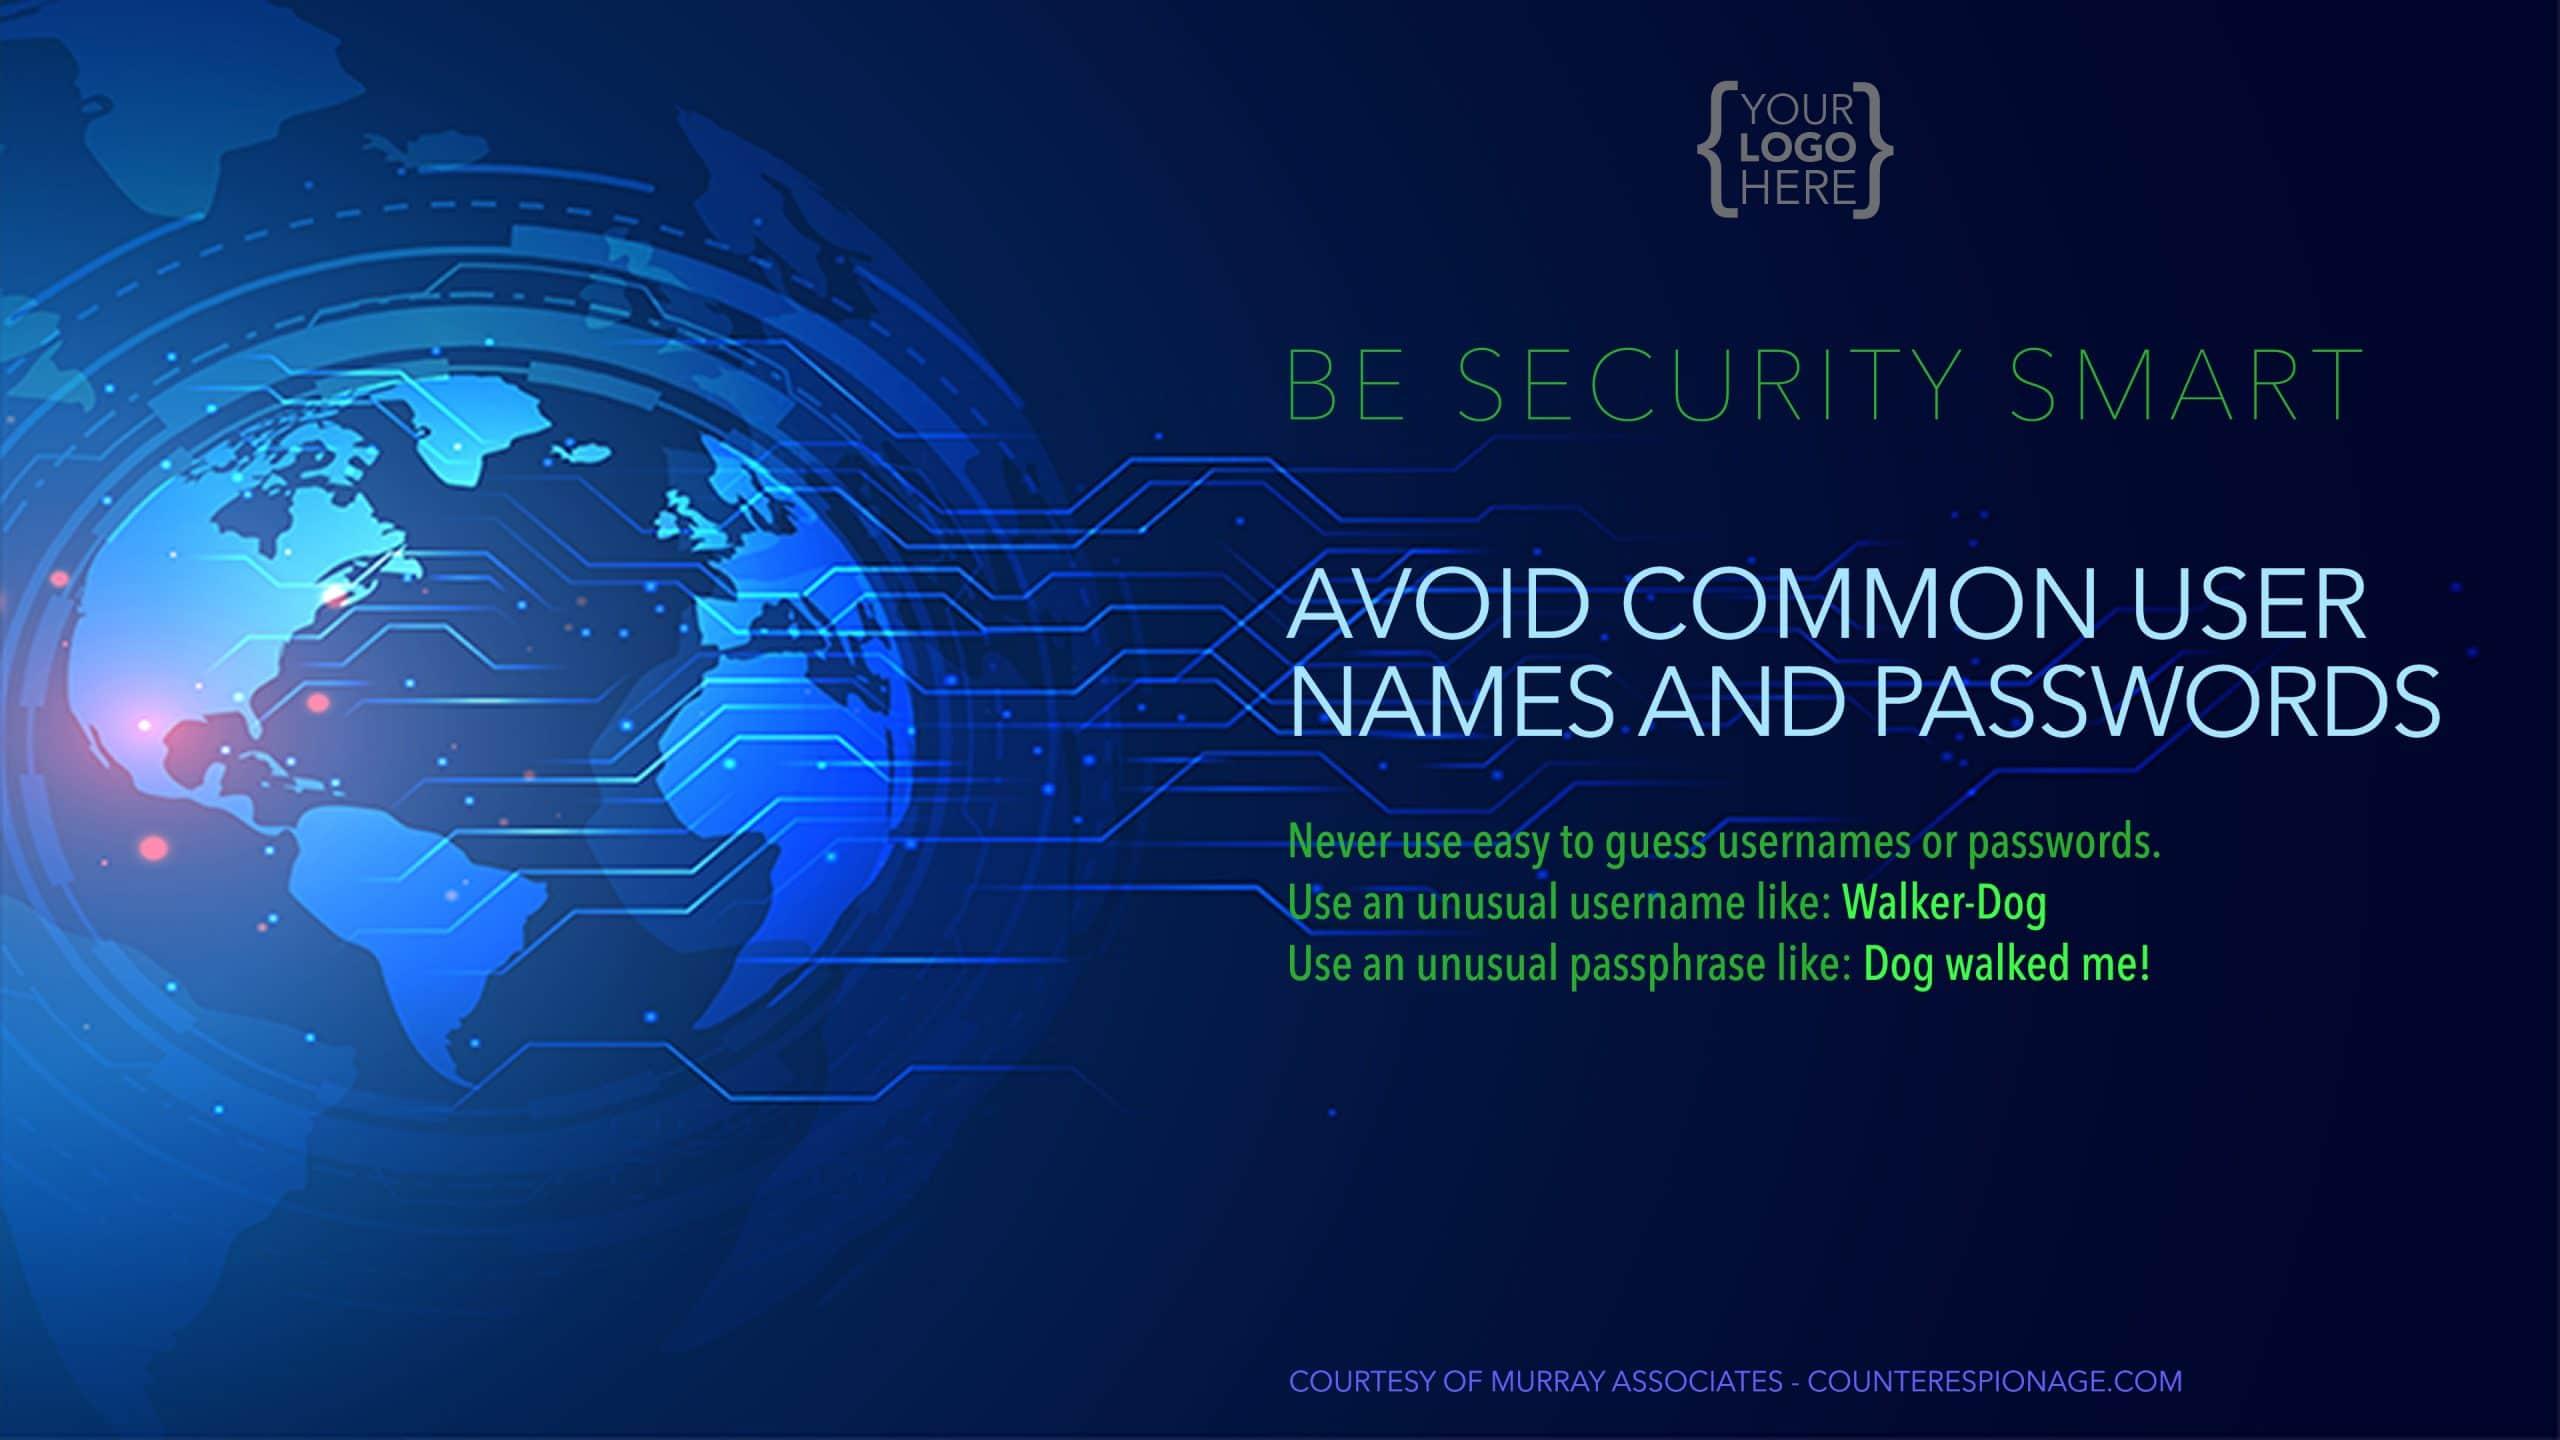 Security Reminder Screen Saver 3 - Avoid